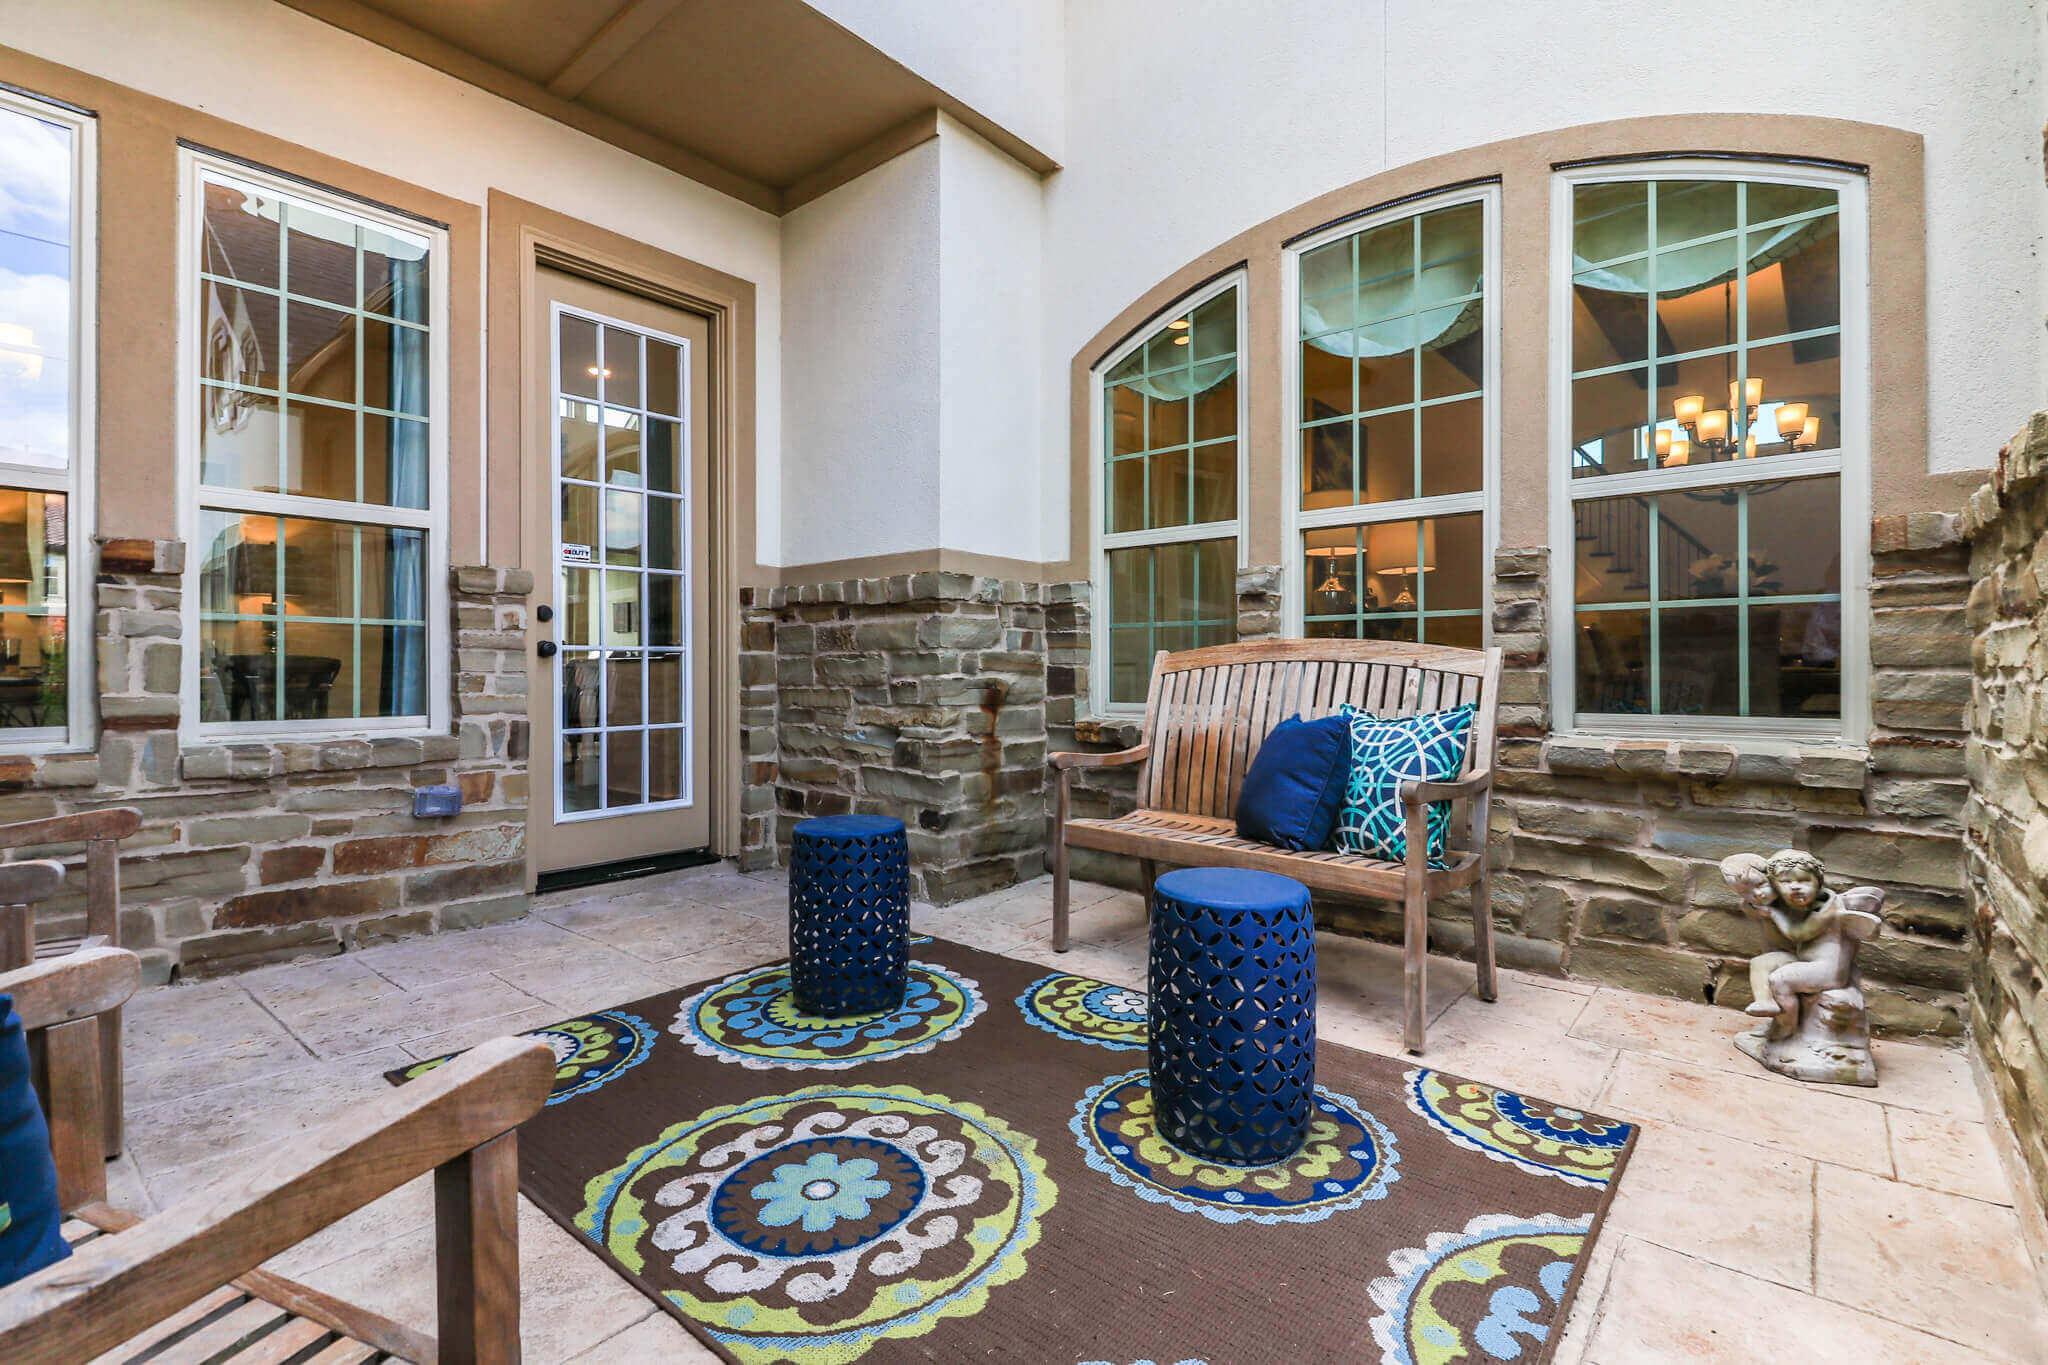 Courtyard - Design 7304